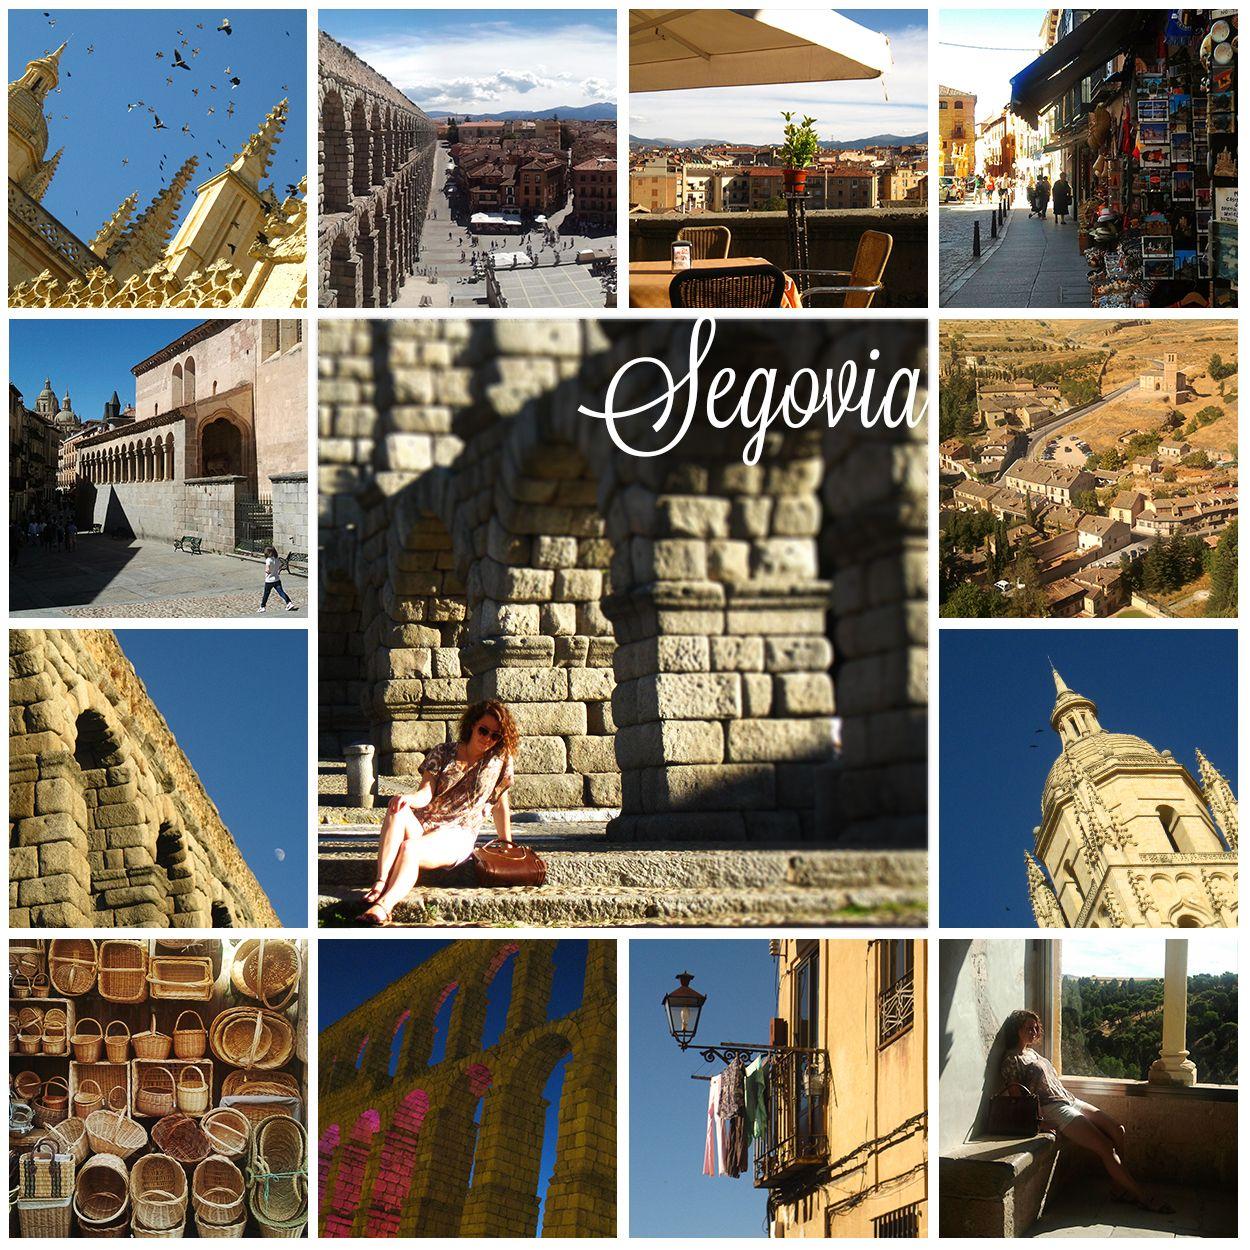 Segovia, Spain. Photo tiles mosaic. ANIA W PODRÓŻY travel blog and photography